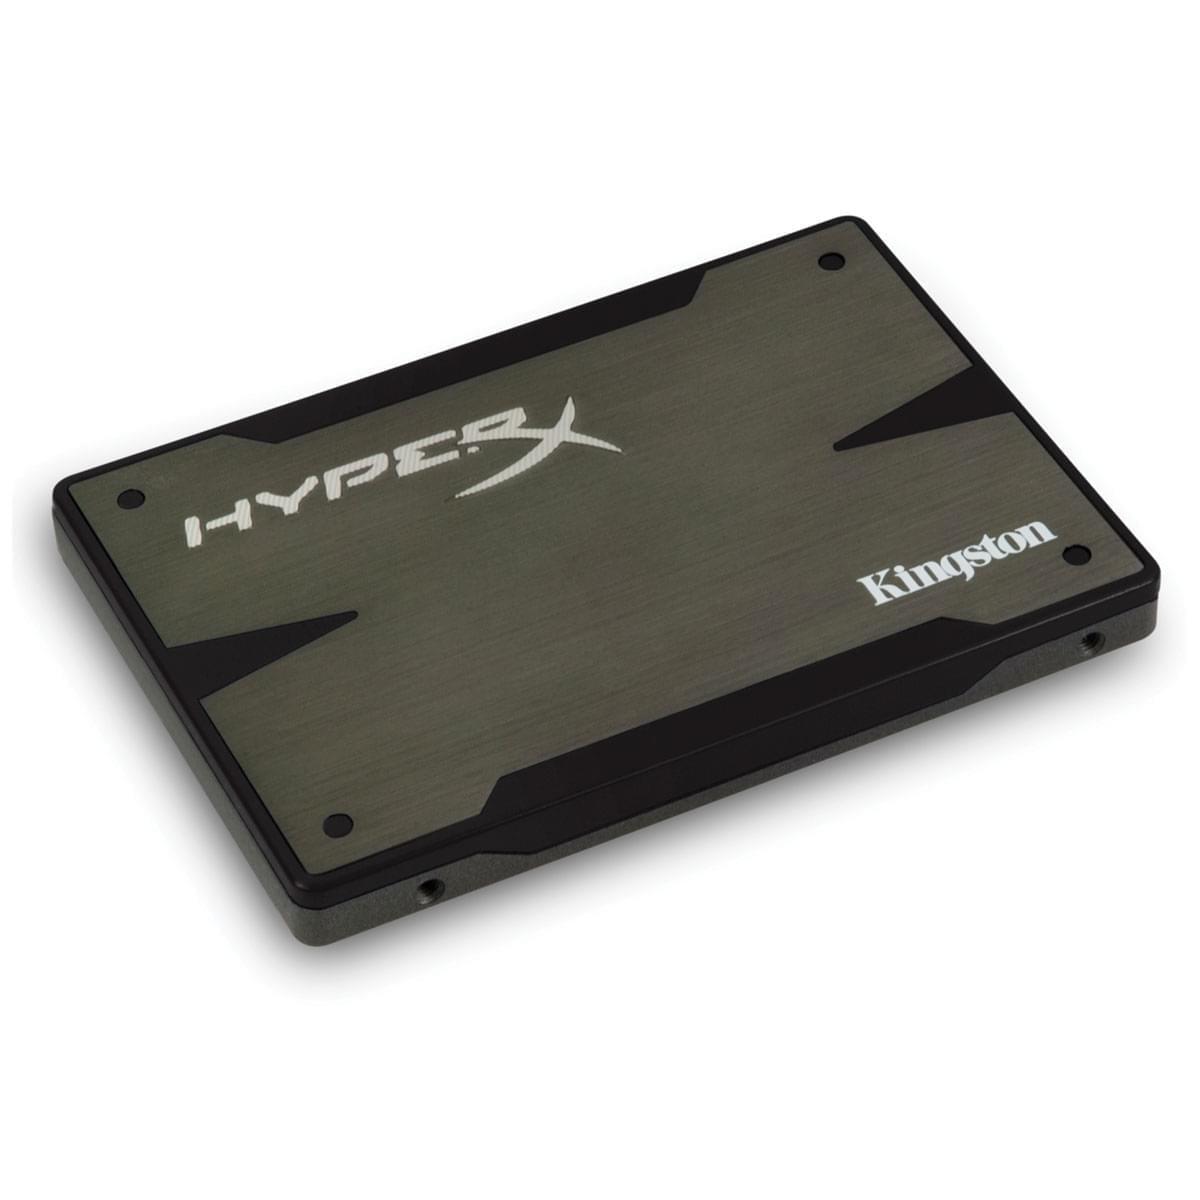 Kingston 120Go SSD HyperX SATA III SH103S3/120G (SH103S3/120G) - Achat / Vente Disque SSD sur Cybertek.fr - 0